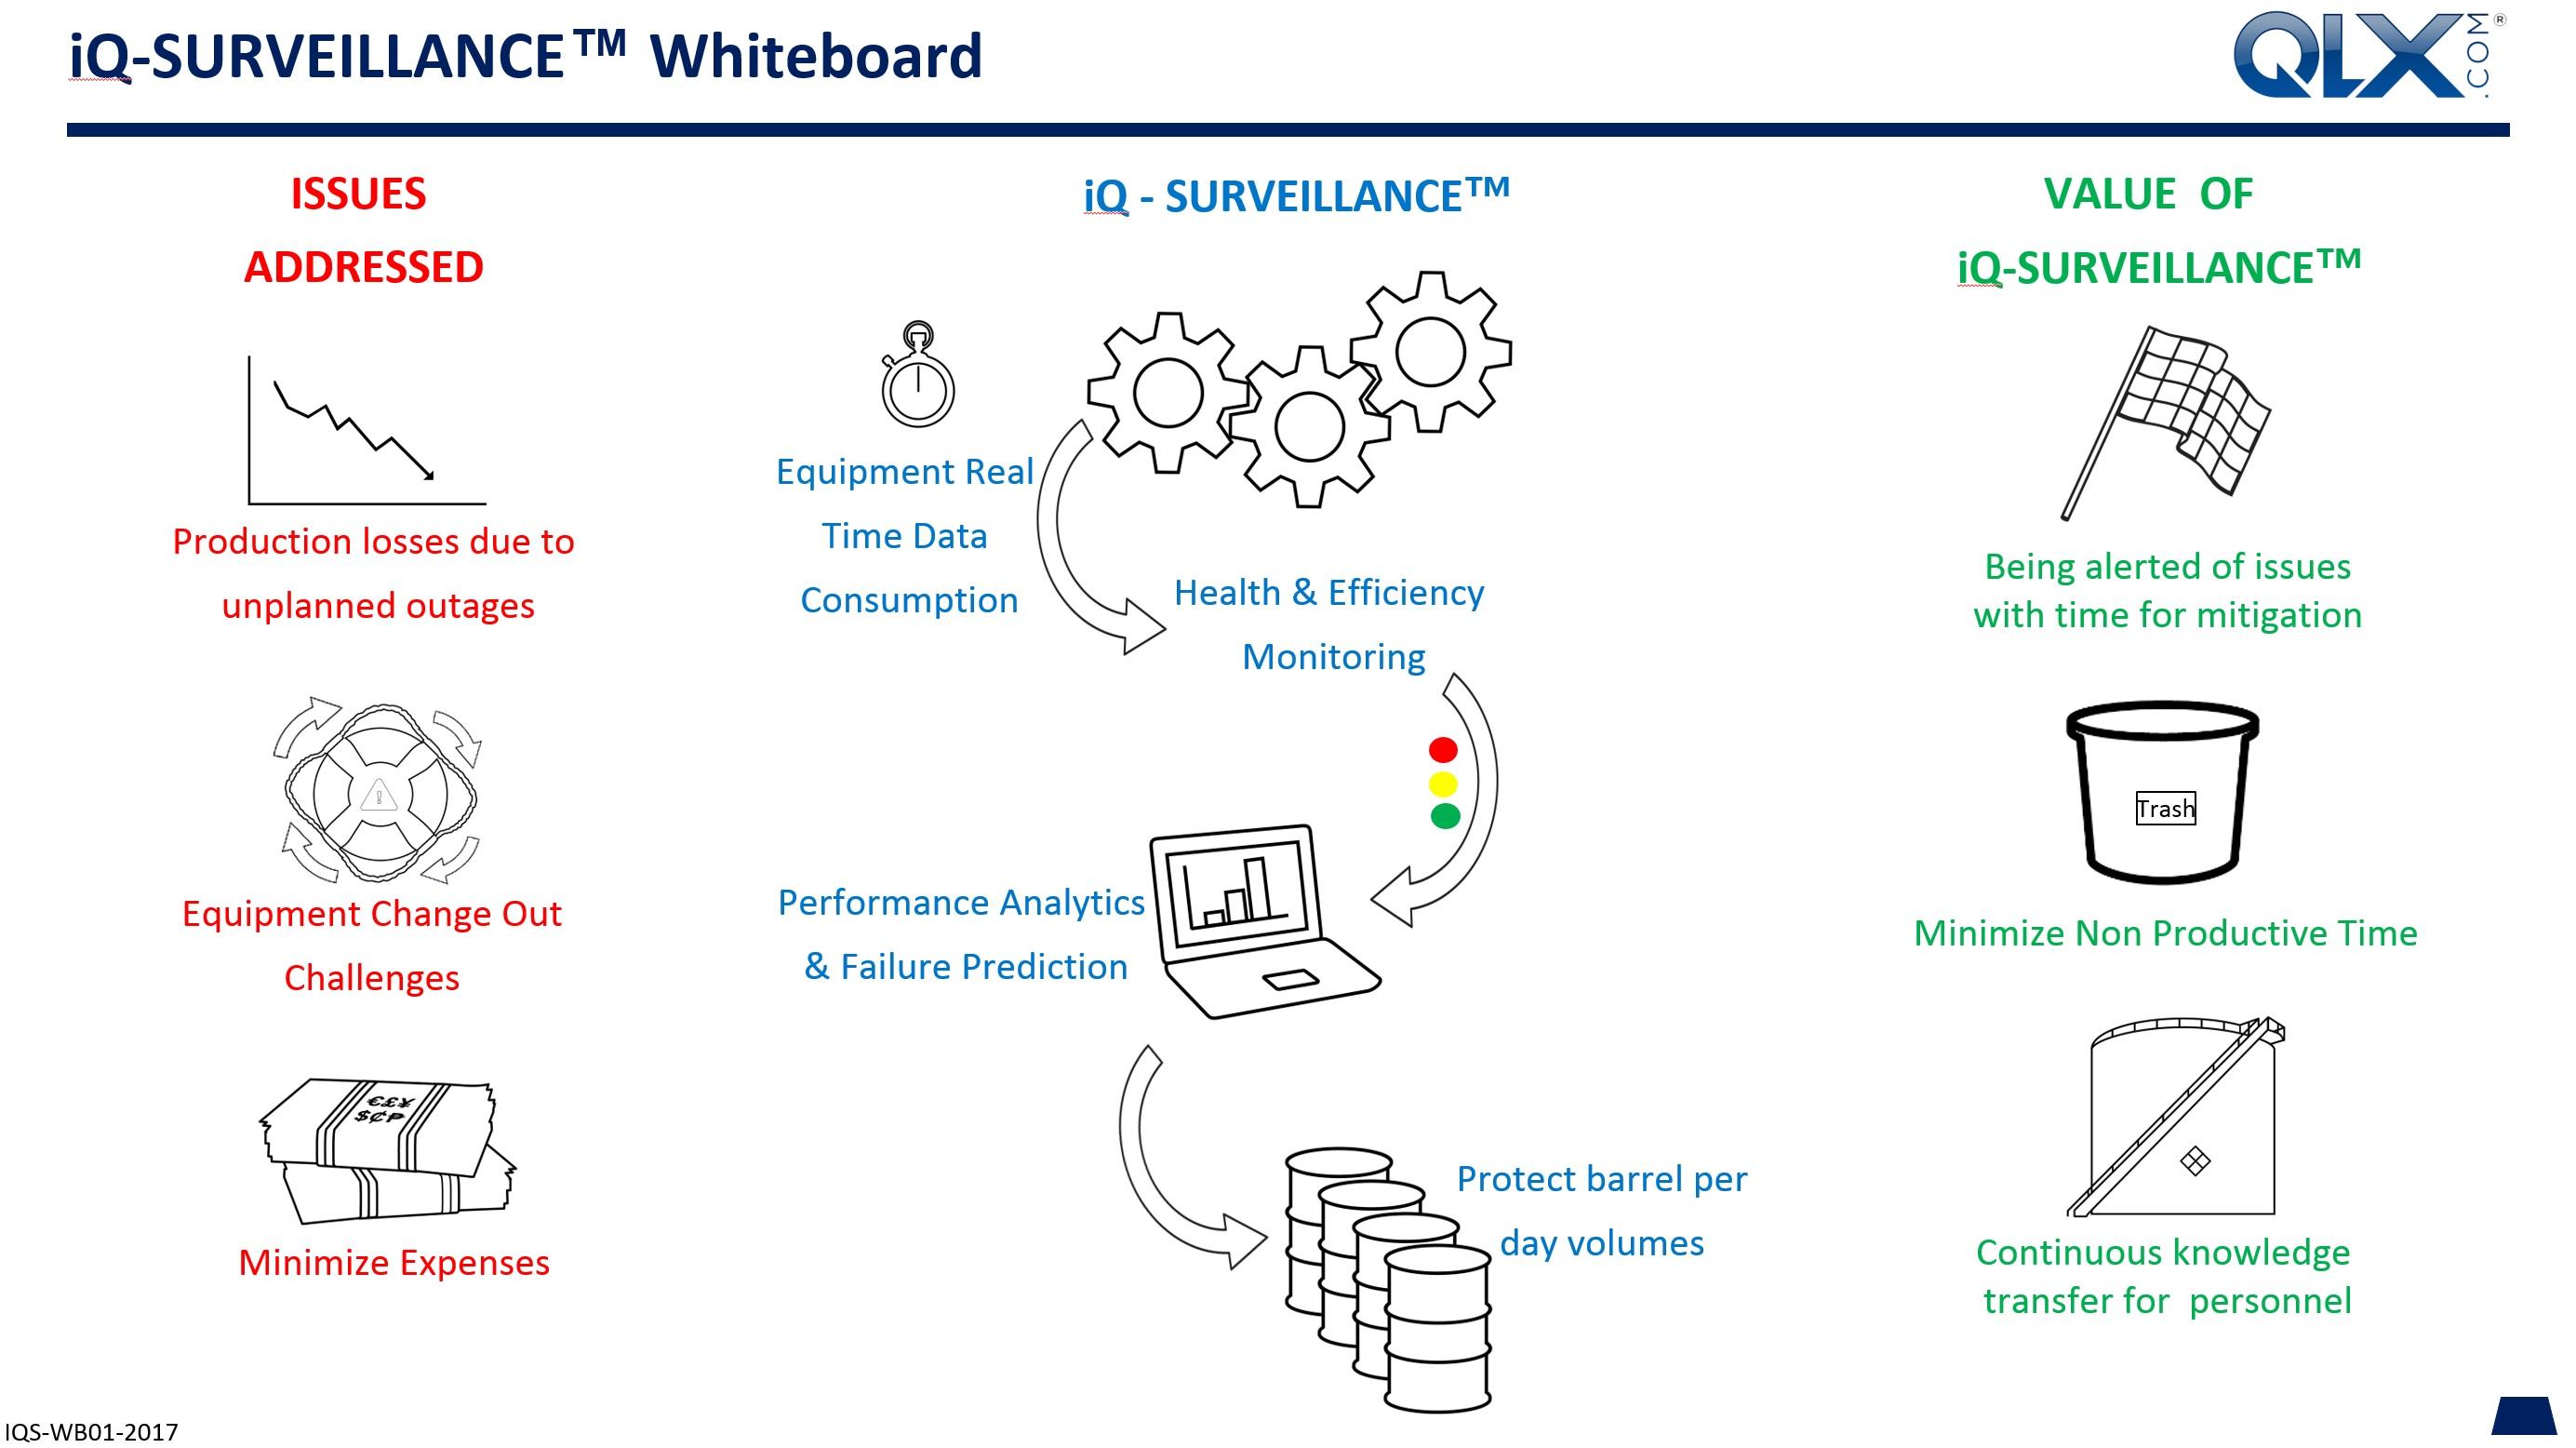 QLX Whiteboard iQ-Surveillance